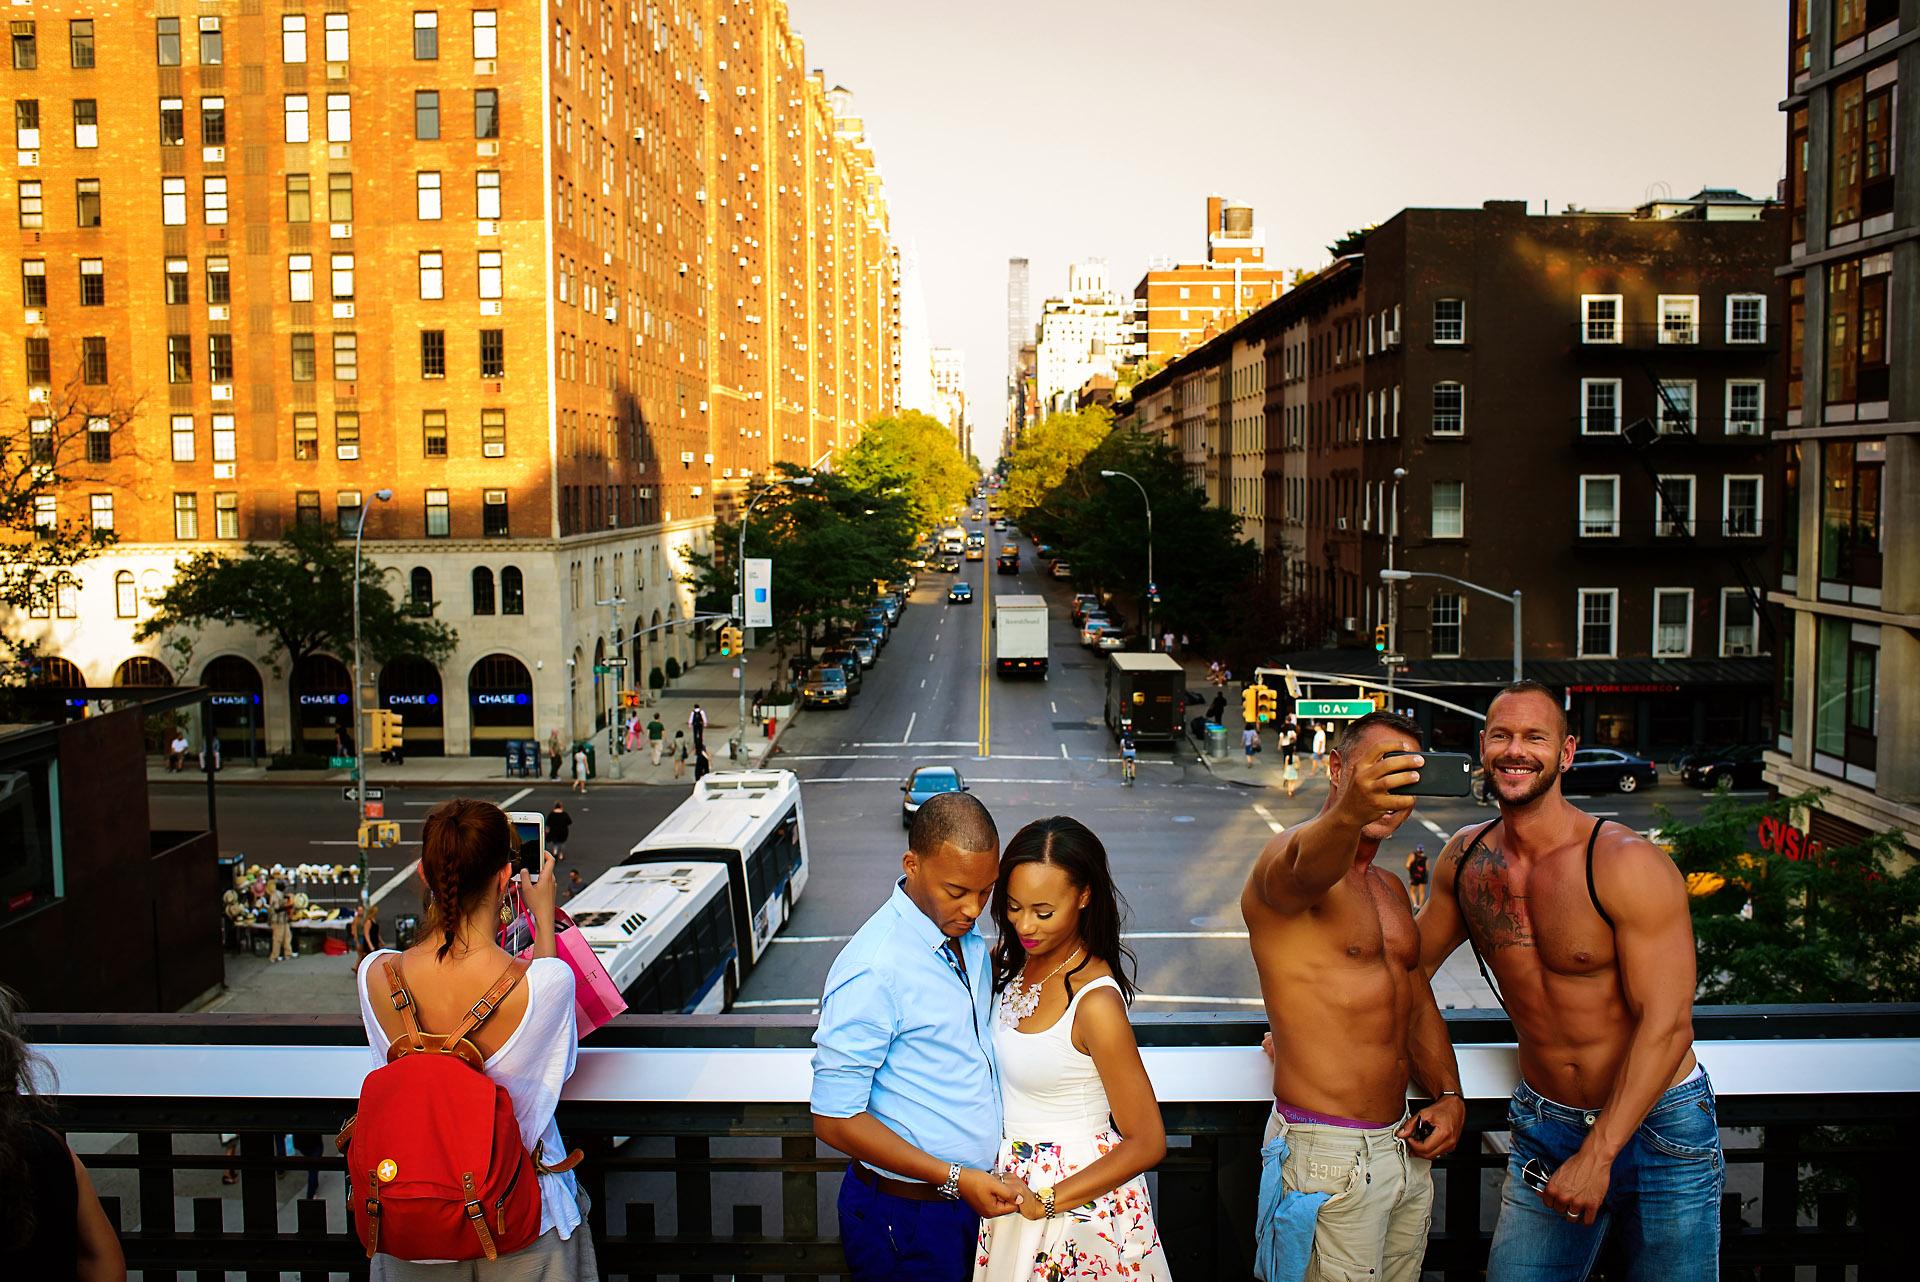 New-York-Engagement-session-photographer05.jpg